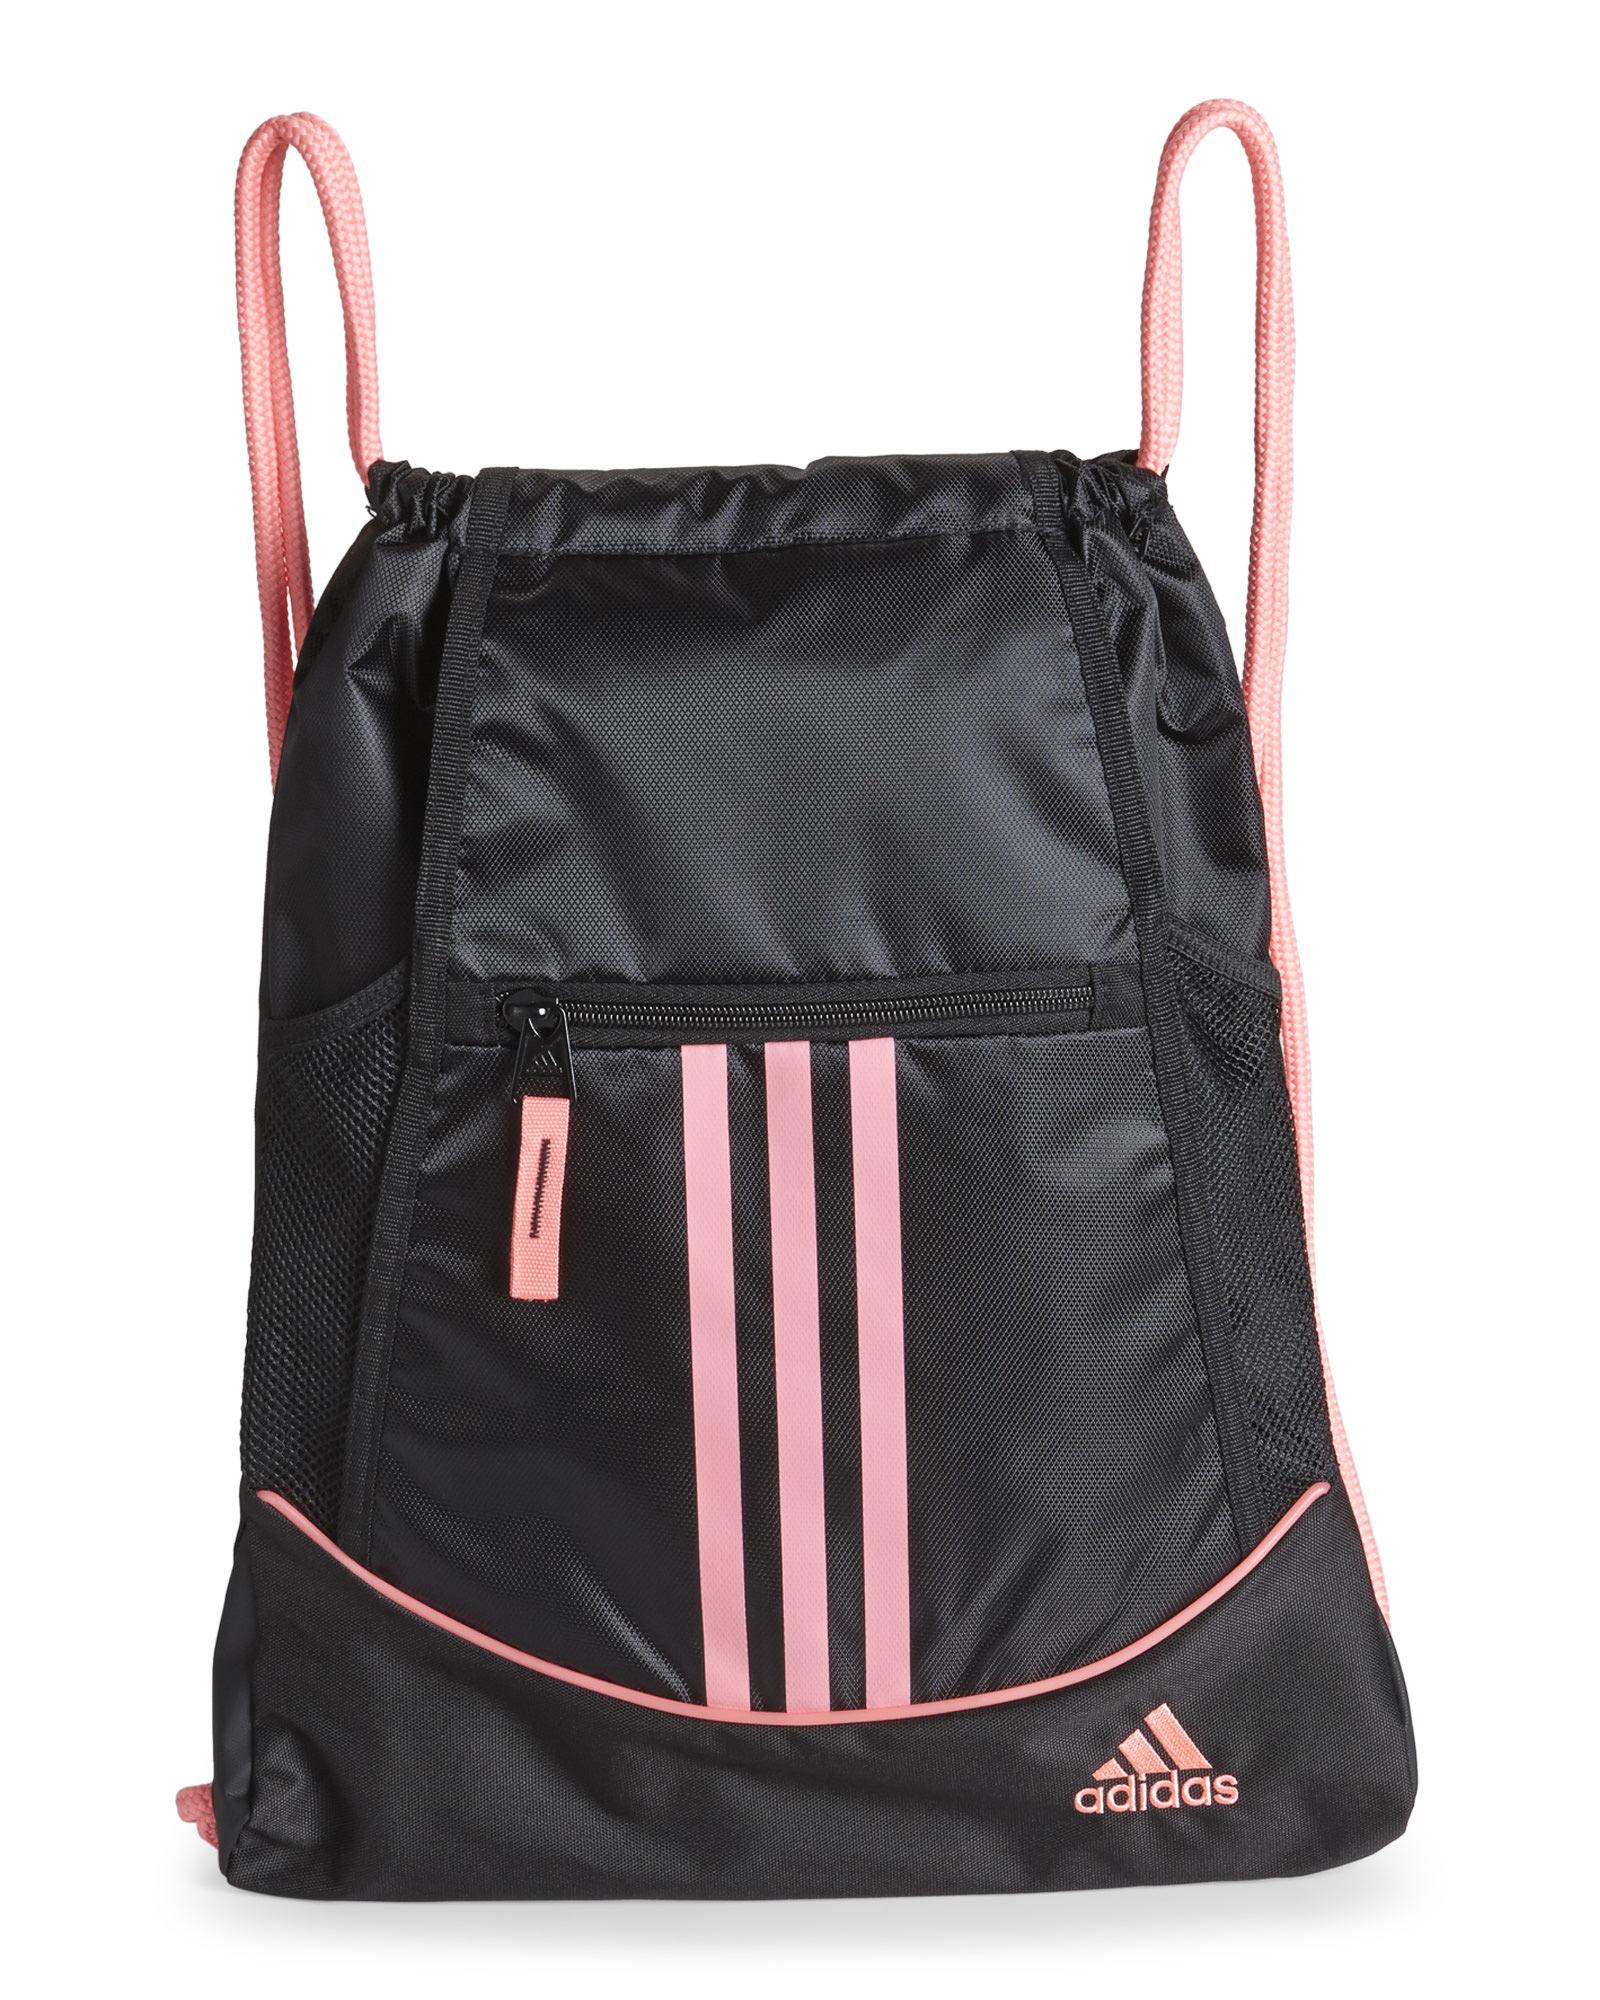 eec2da091394 ... Lyst - Adidas Black Pink Alliance Sack Pack in Black the best attitude  463fc bd2f6 ...